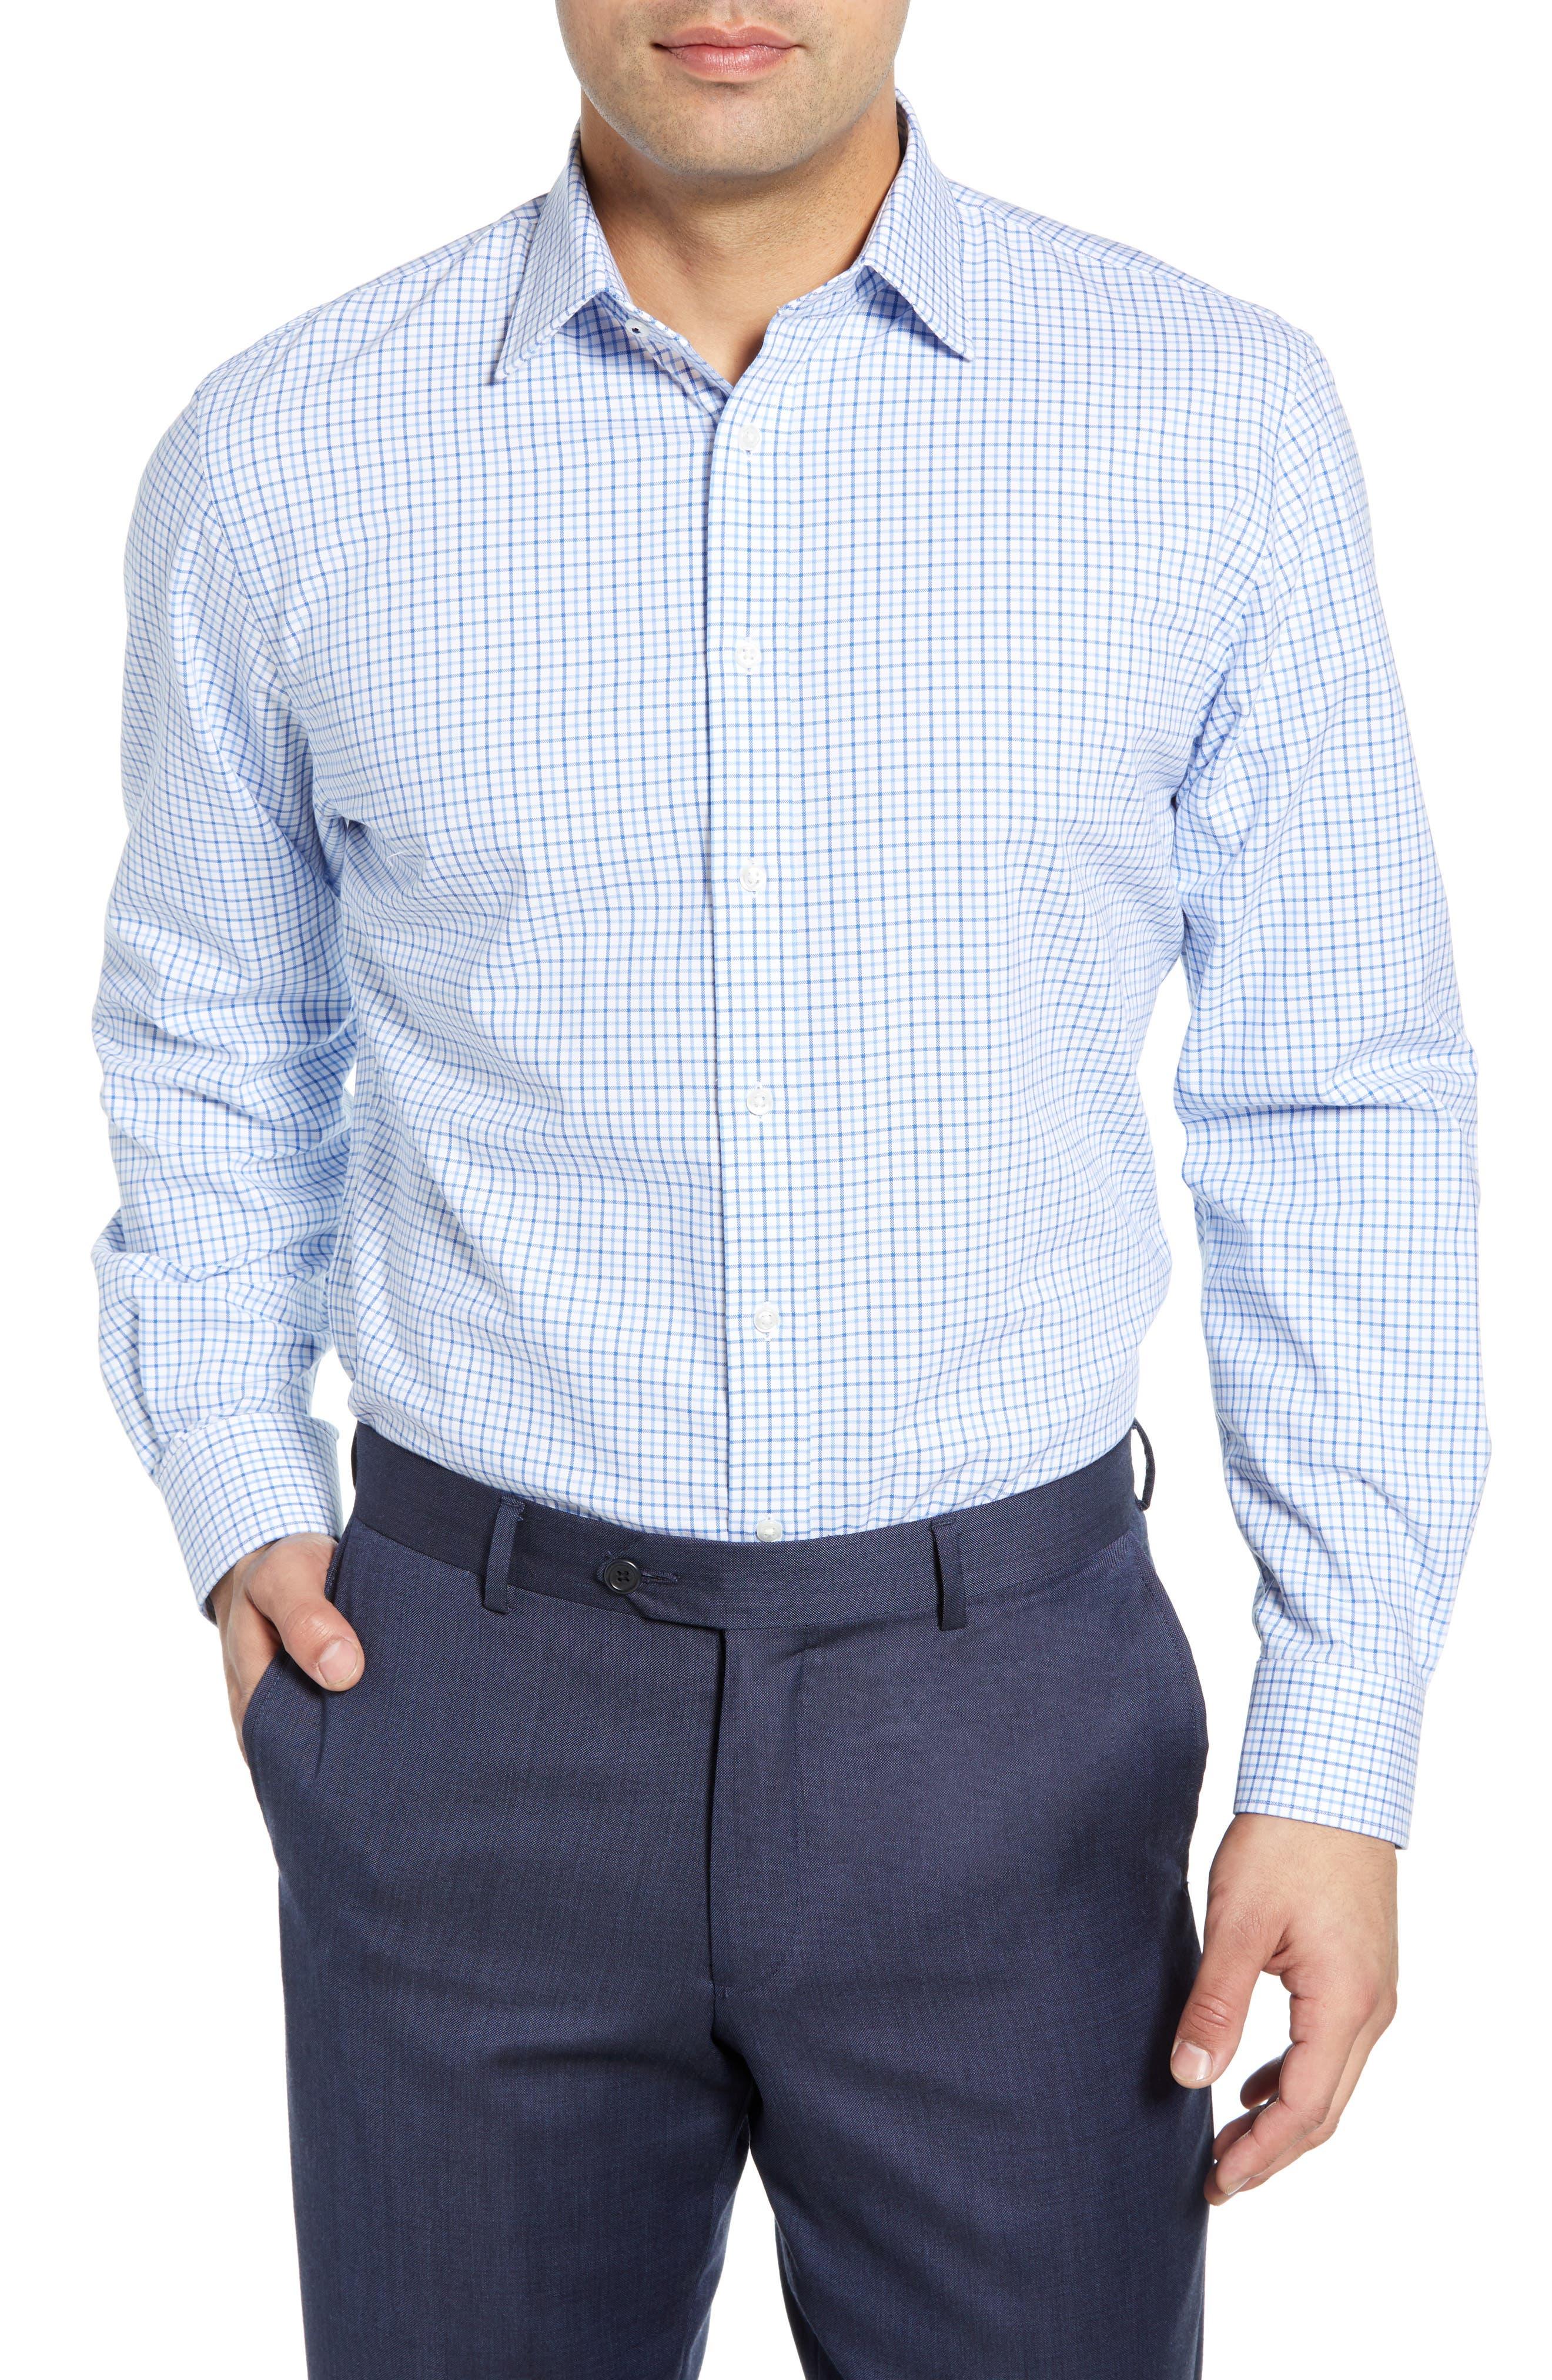 NORDSTROM MEN'S SHOP,                             Tech-Smart Traditional Fit Check Stretch Dress Shirt,                             Main thumbnail 1, color,                             BLUE VICTORIA